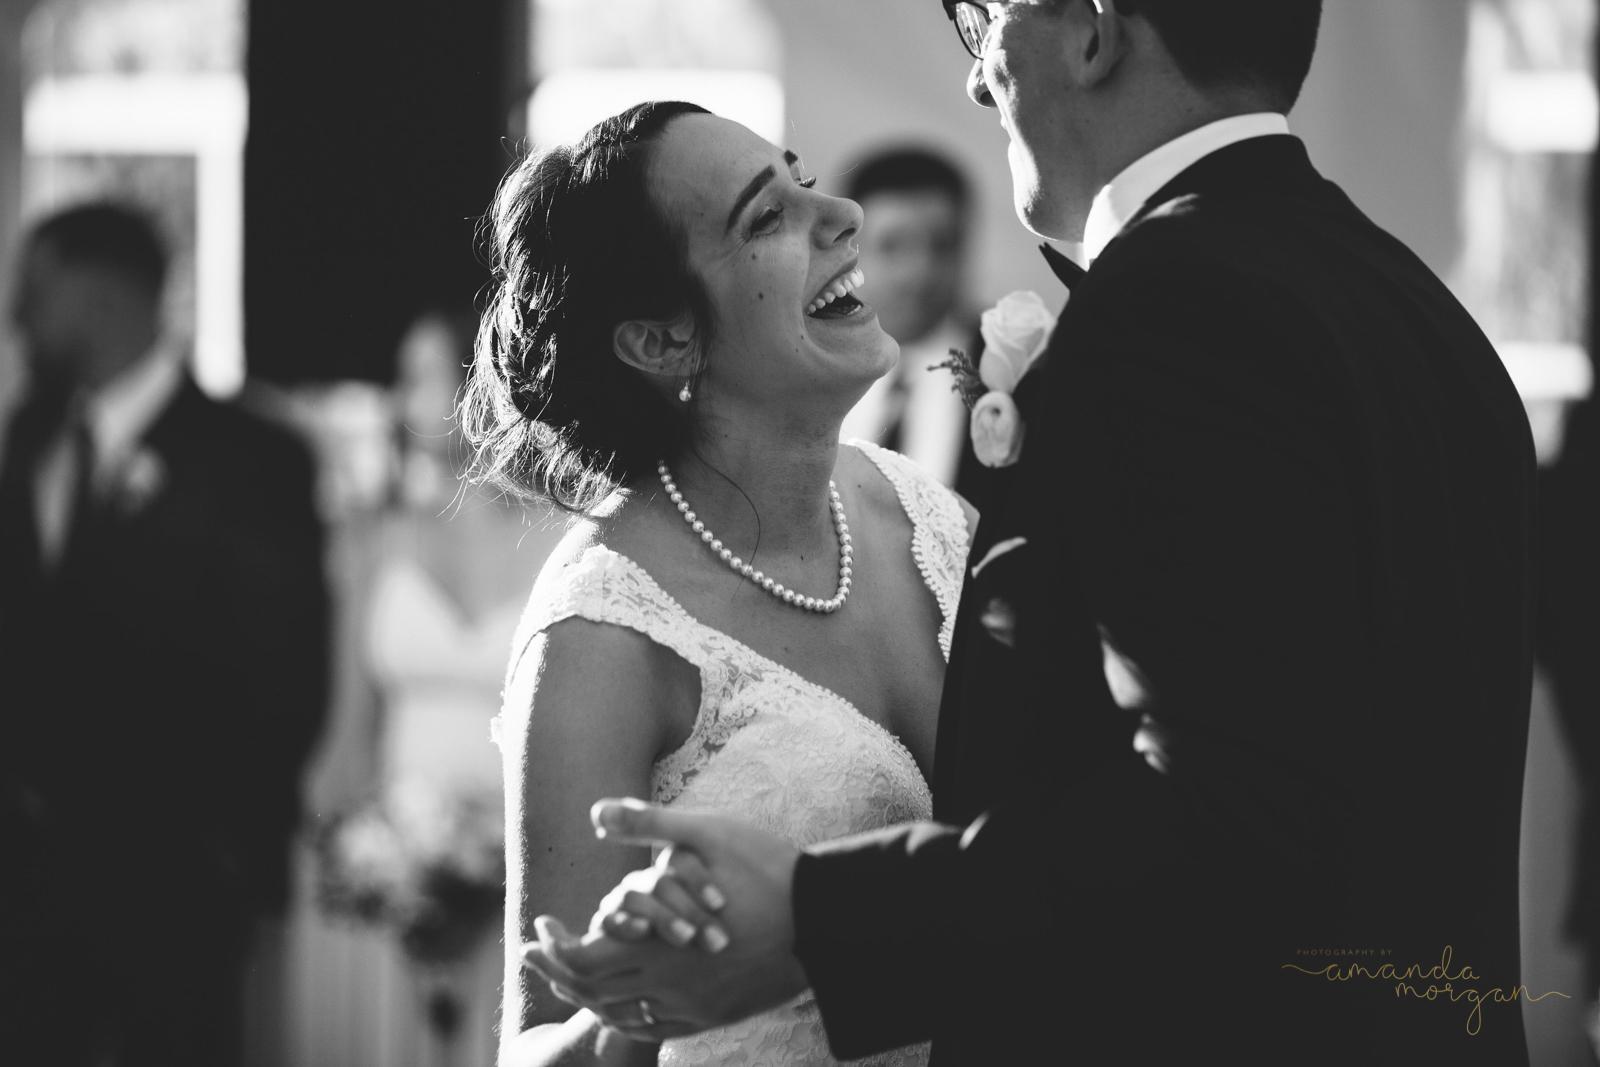 Publick-House-Wedding-Amanda-Morgan-57.jpg